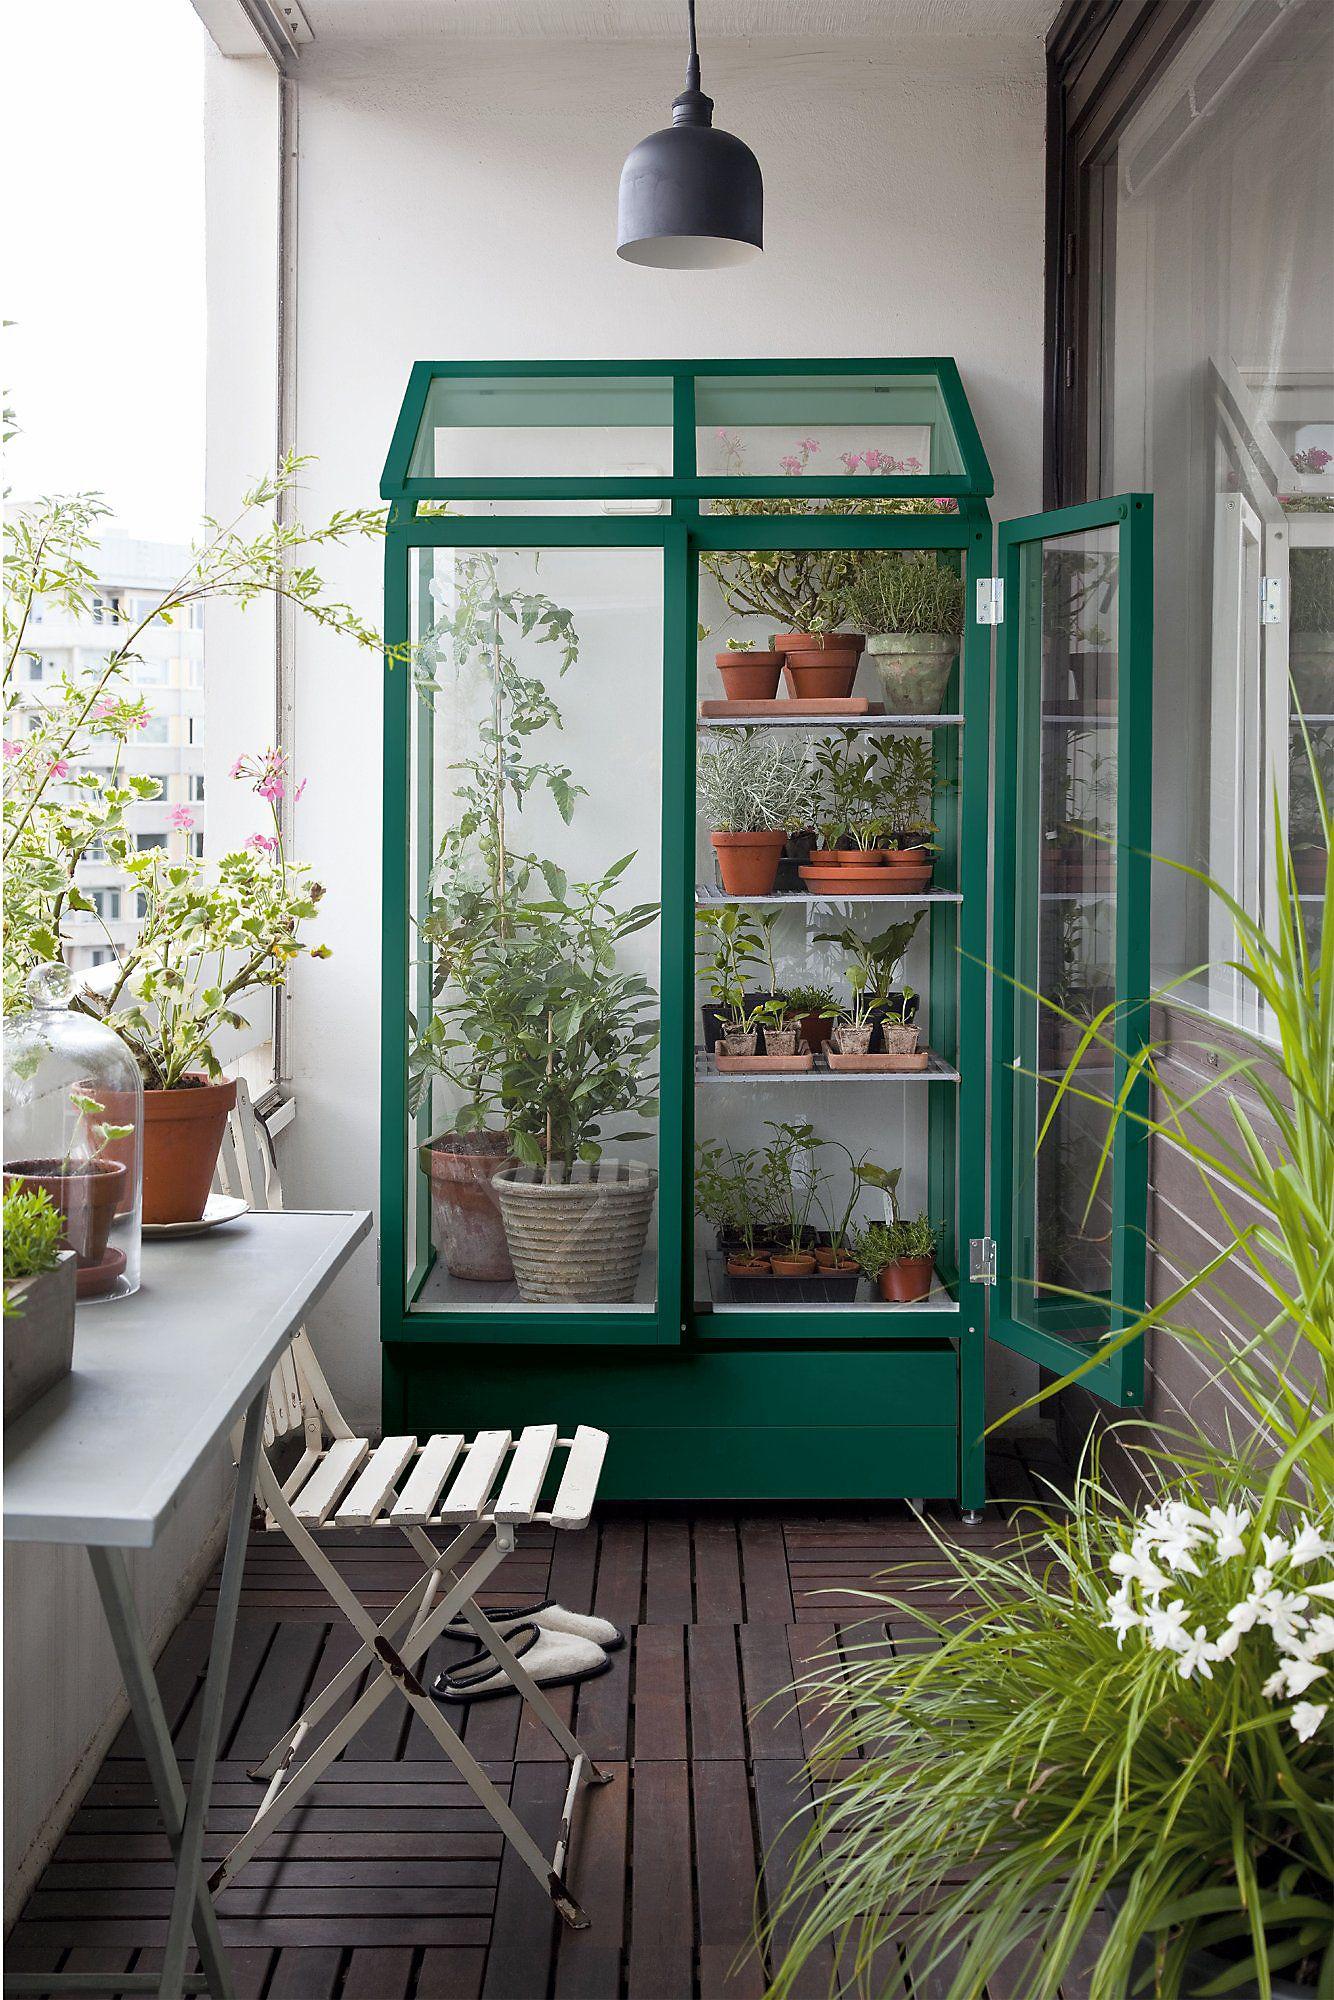 Balkongewächshaus Glas und Kiefernholz | • House • | Pinterest ...